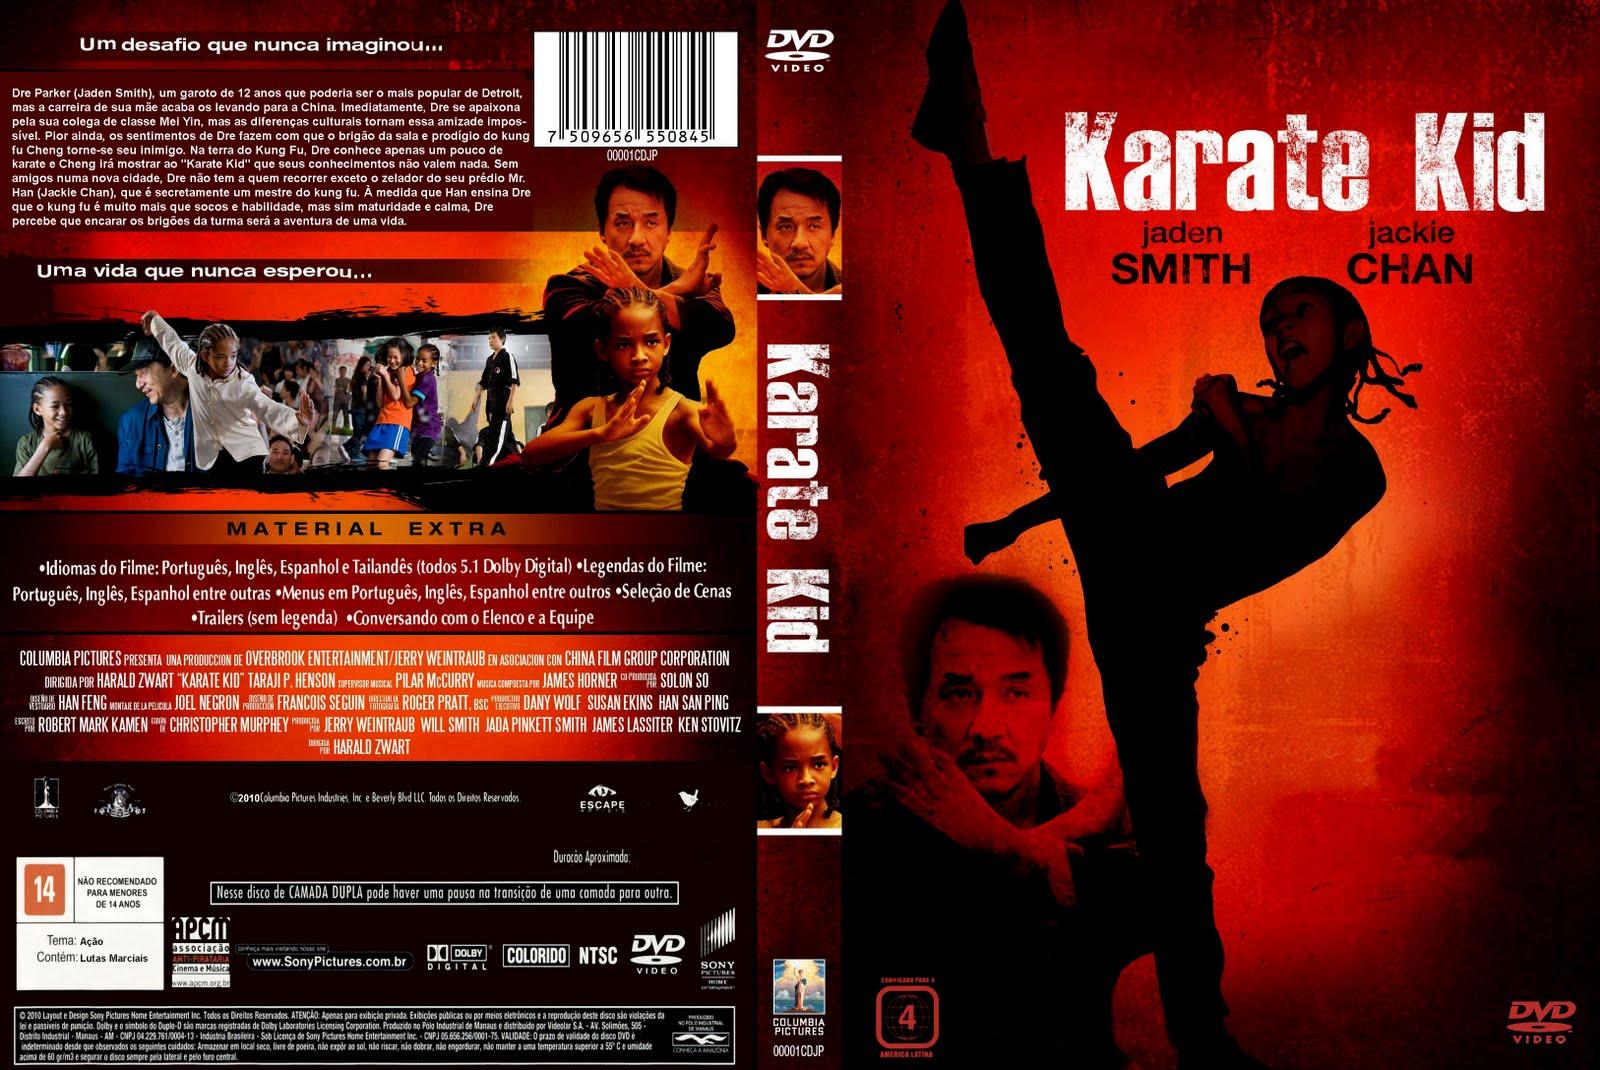 http://3.bp.blogspot.com/_OMLPkupWrhs/THzc6yjRVvI/AAAAAAAACGY/NIq92BANrJg/s1600/Karate+Kid.jpg